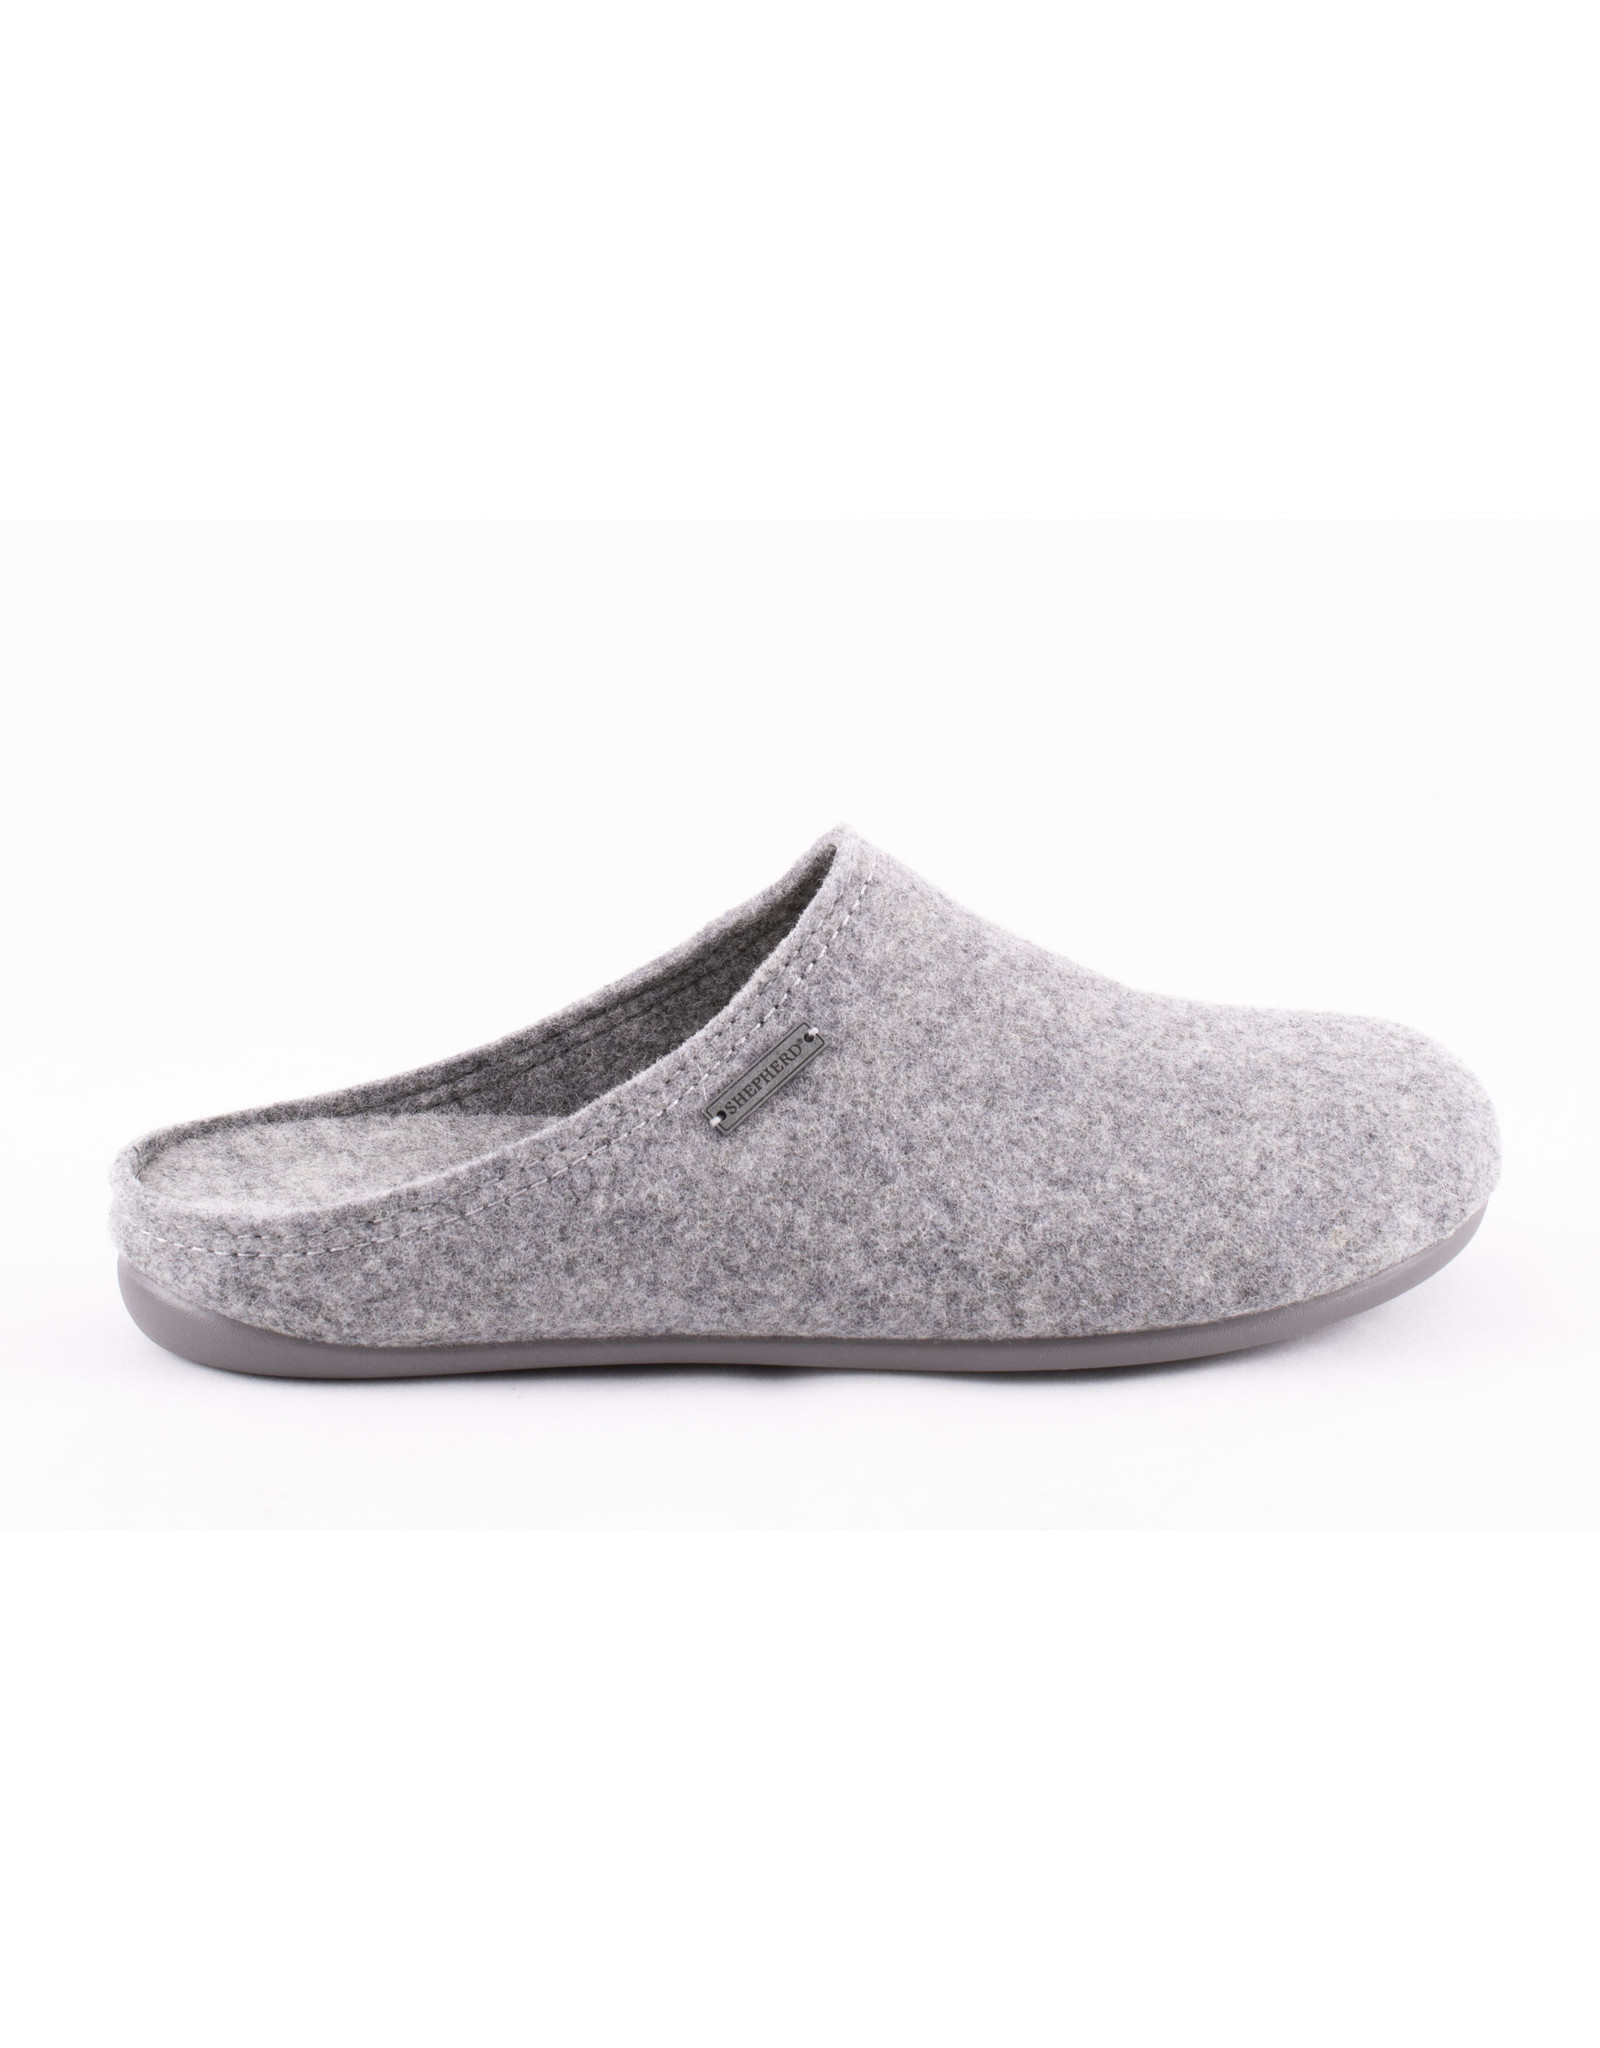 Shepherd pantoffel instap echt wol grijs